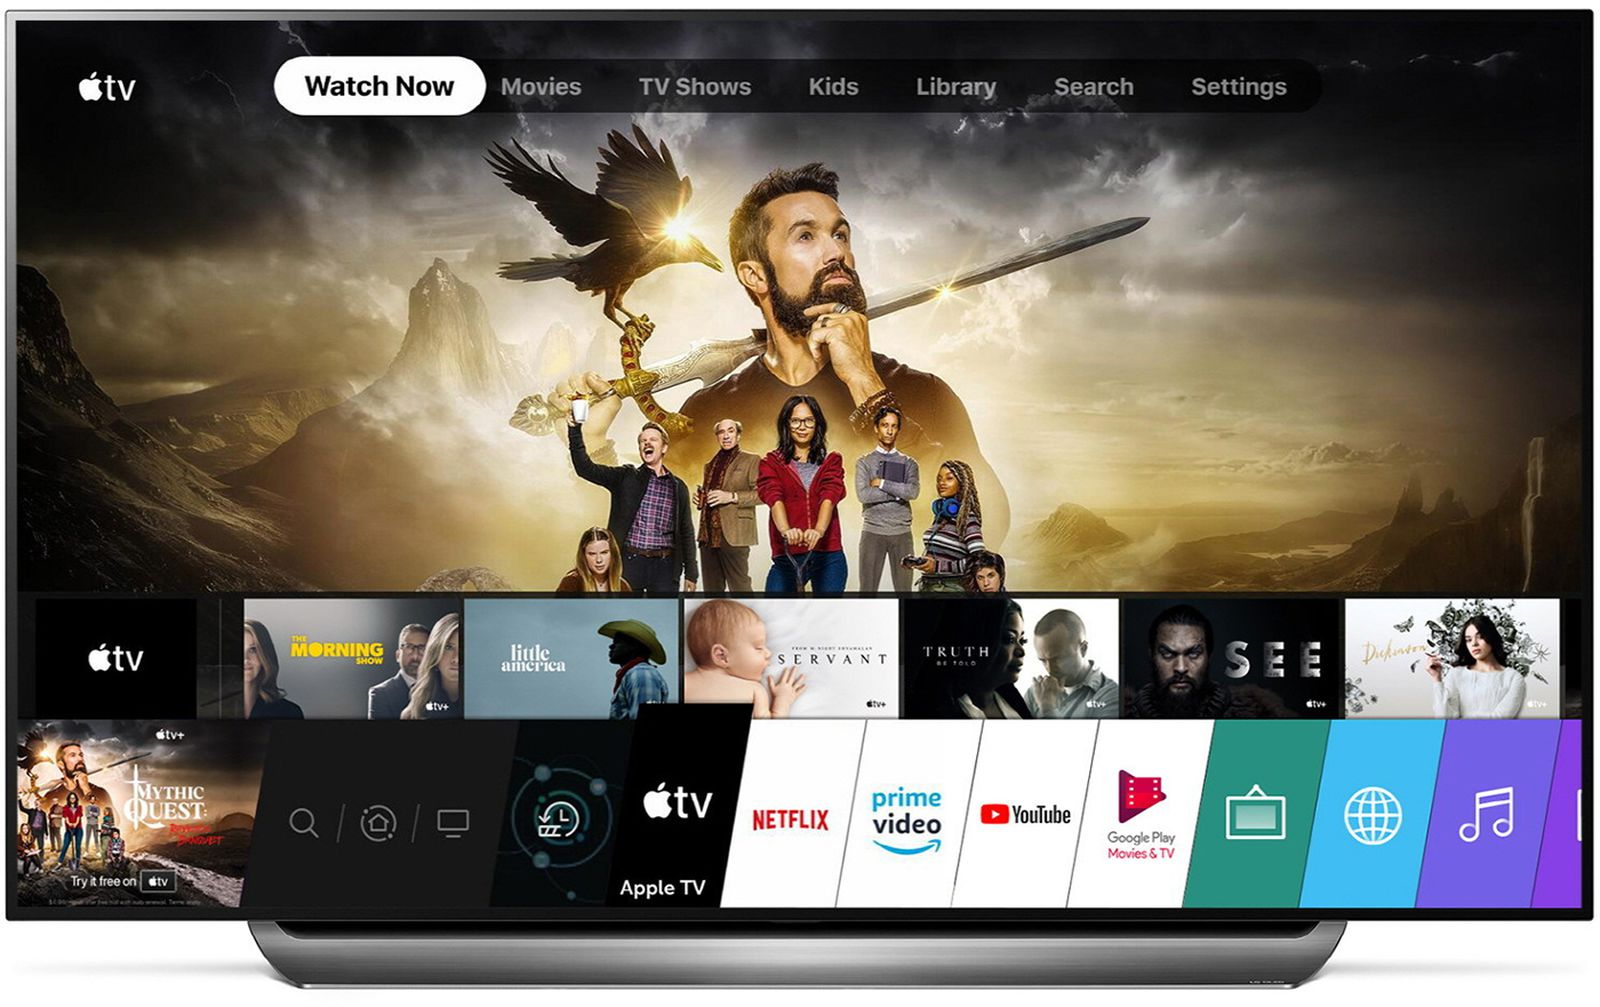 apple-tv-app-select-2019-lg-tvs